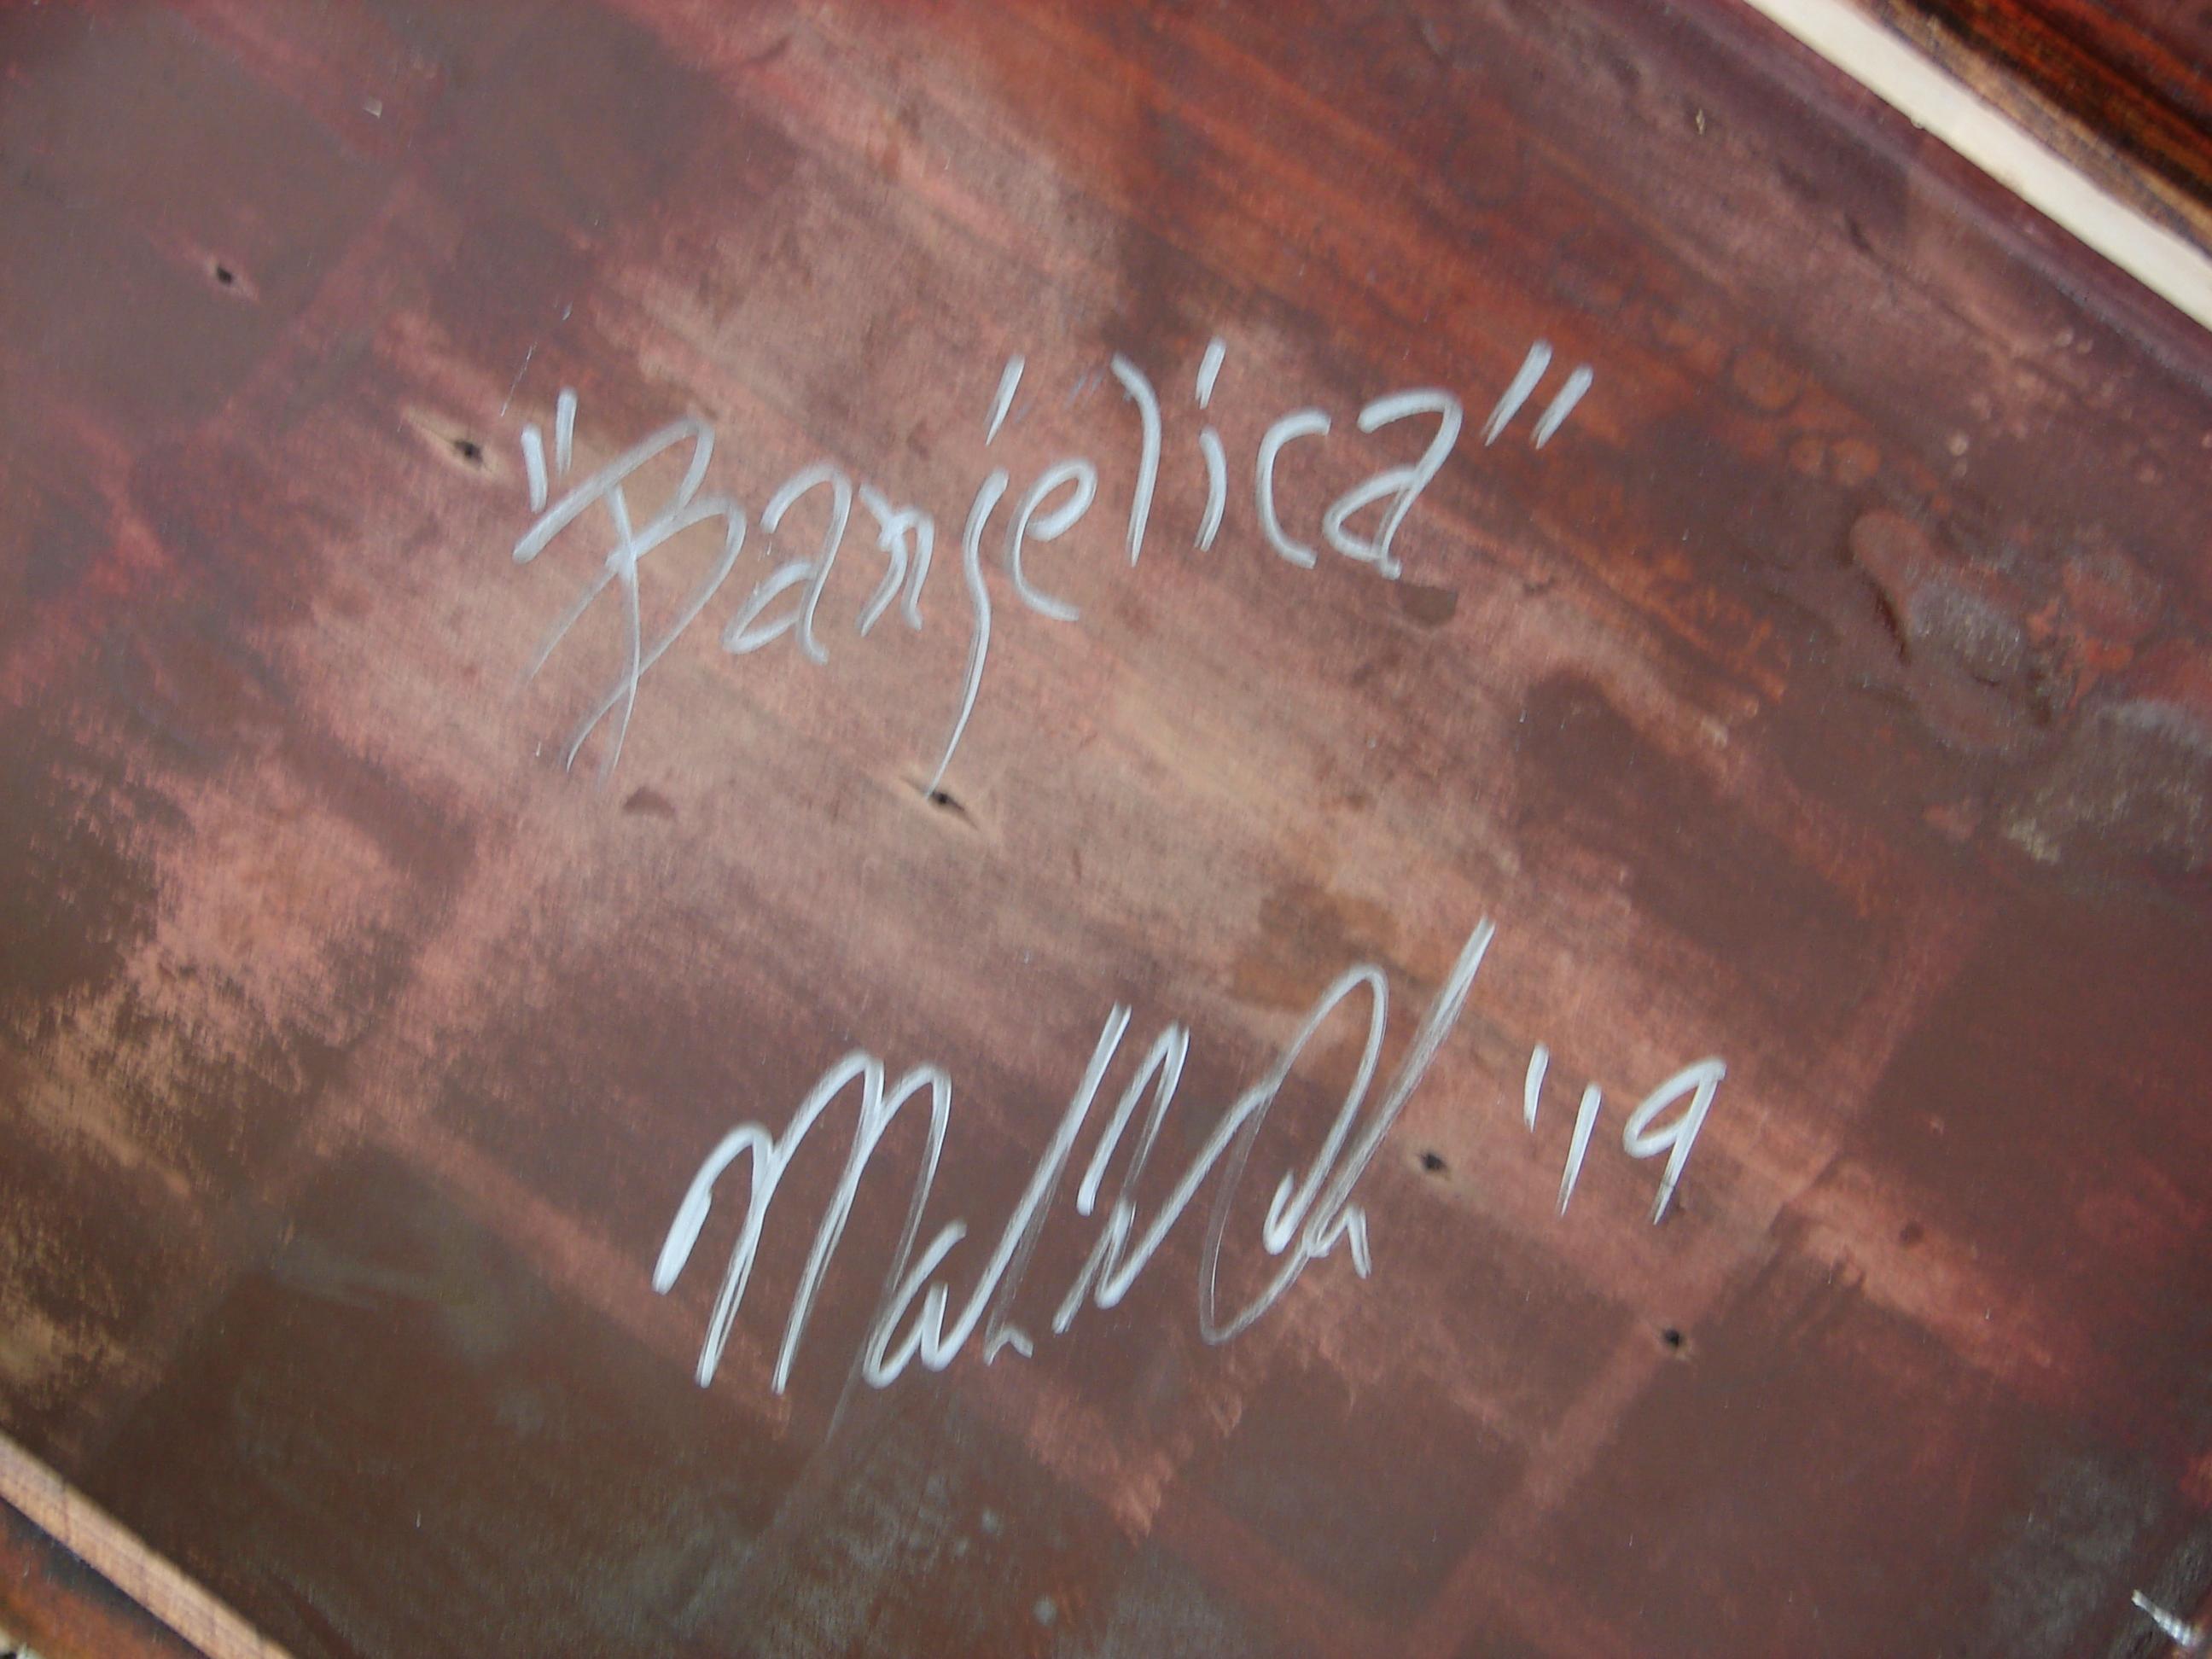 Artist Signed Inside